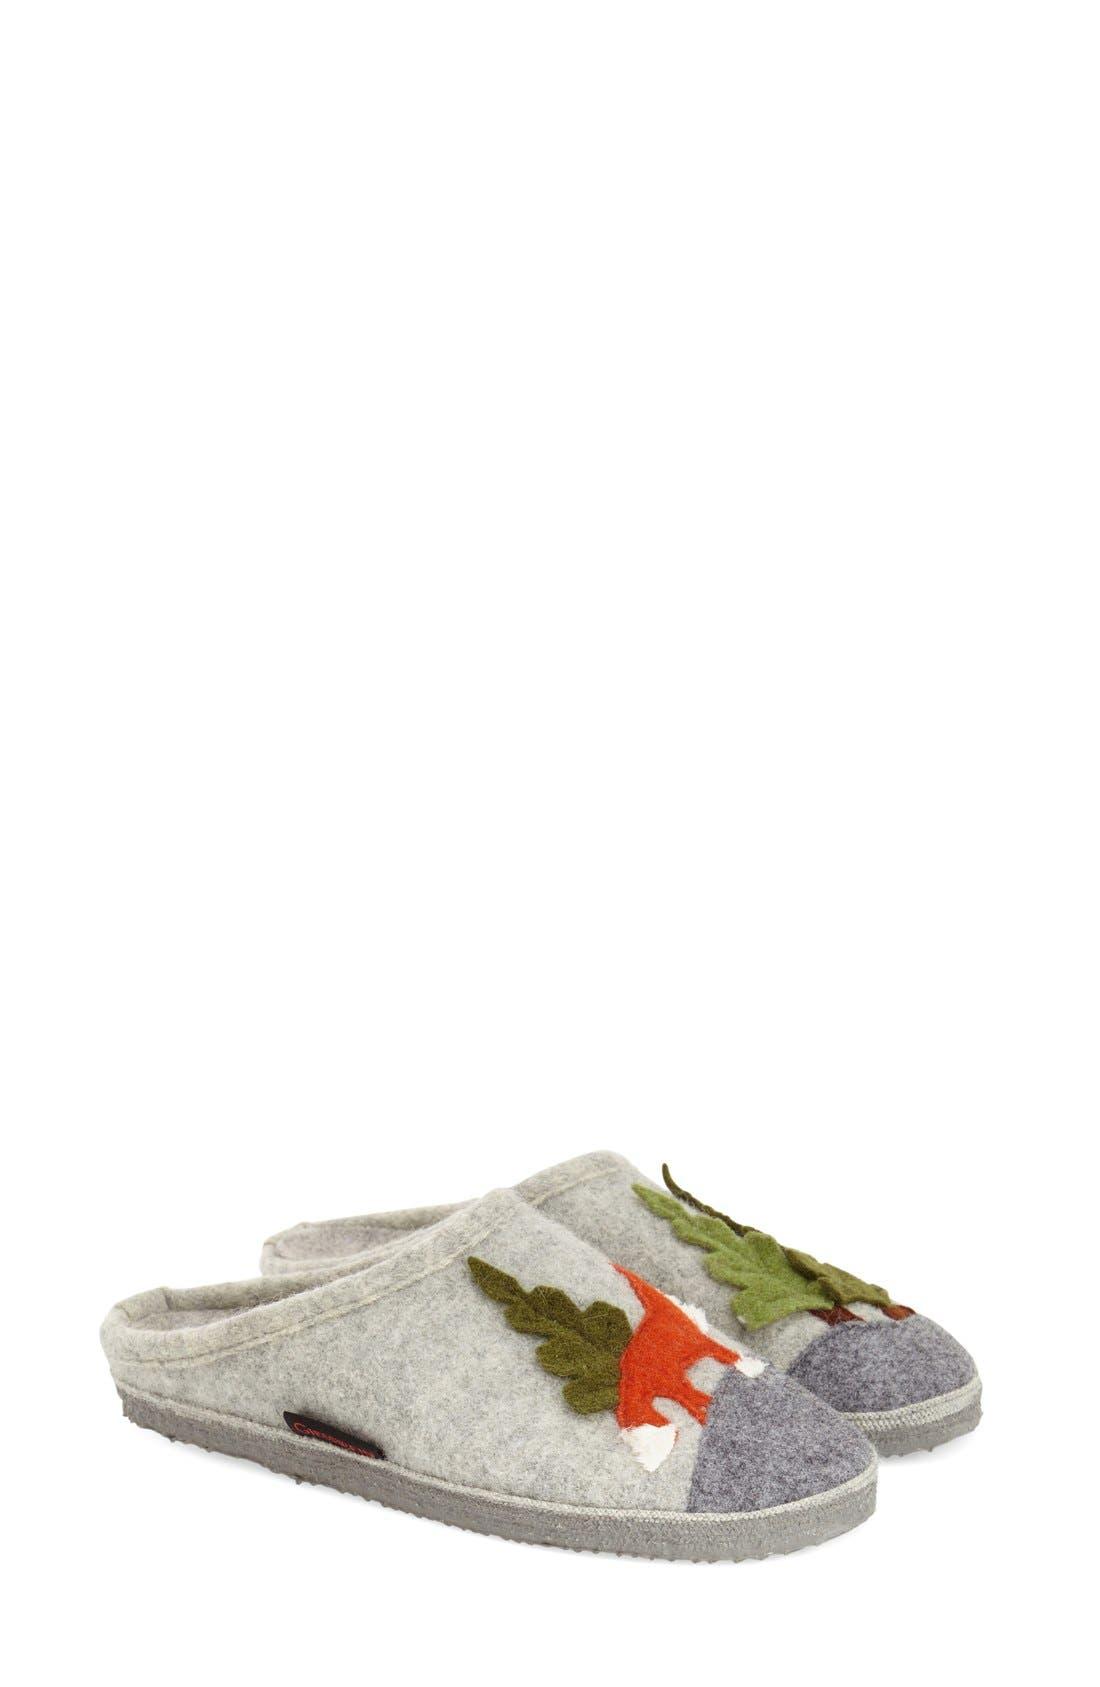 'Laura' Slipper,                             Main thumbnail 1, color,                             Grey Wool